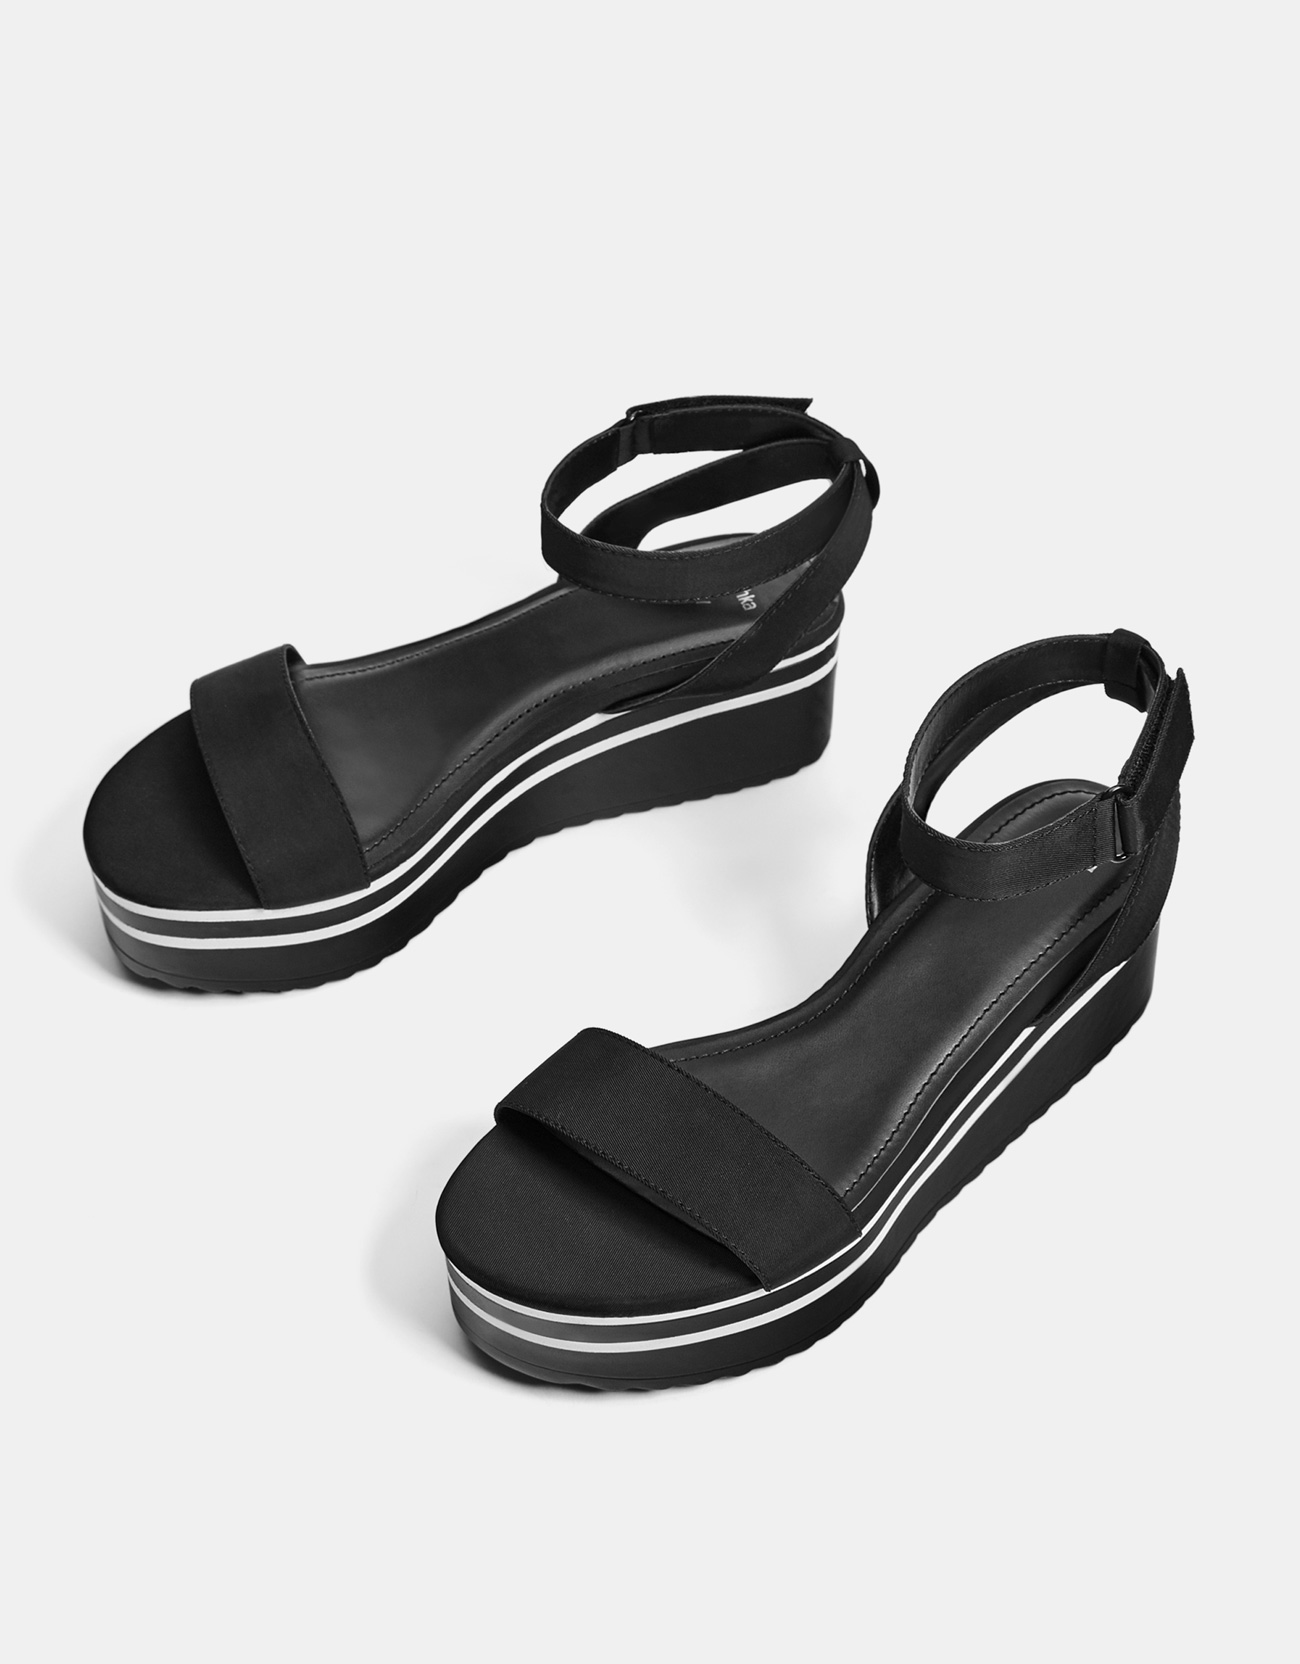 e945b60b33b Sporty platform sandals - SHOES - Bershka Sweden